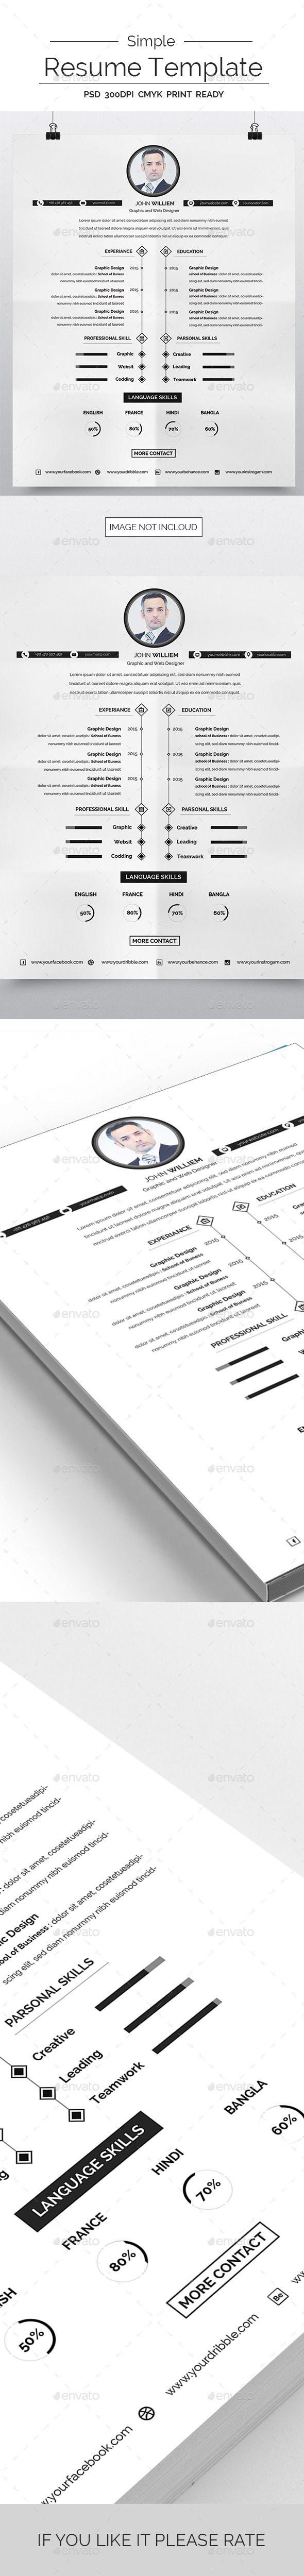 Best 25 Simple resume template ideas on Pinterest Simple cv